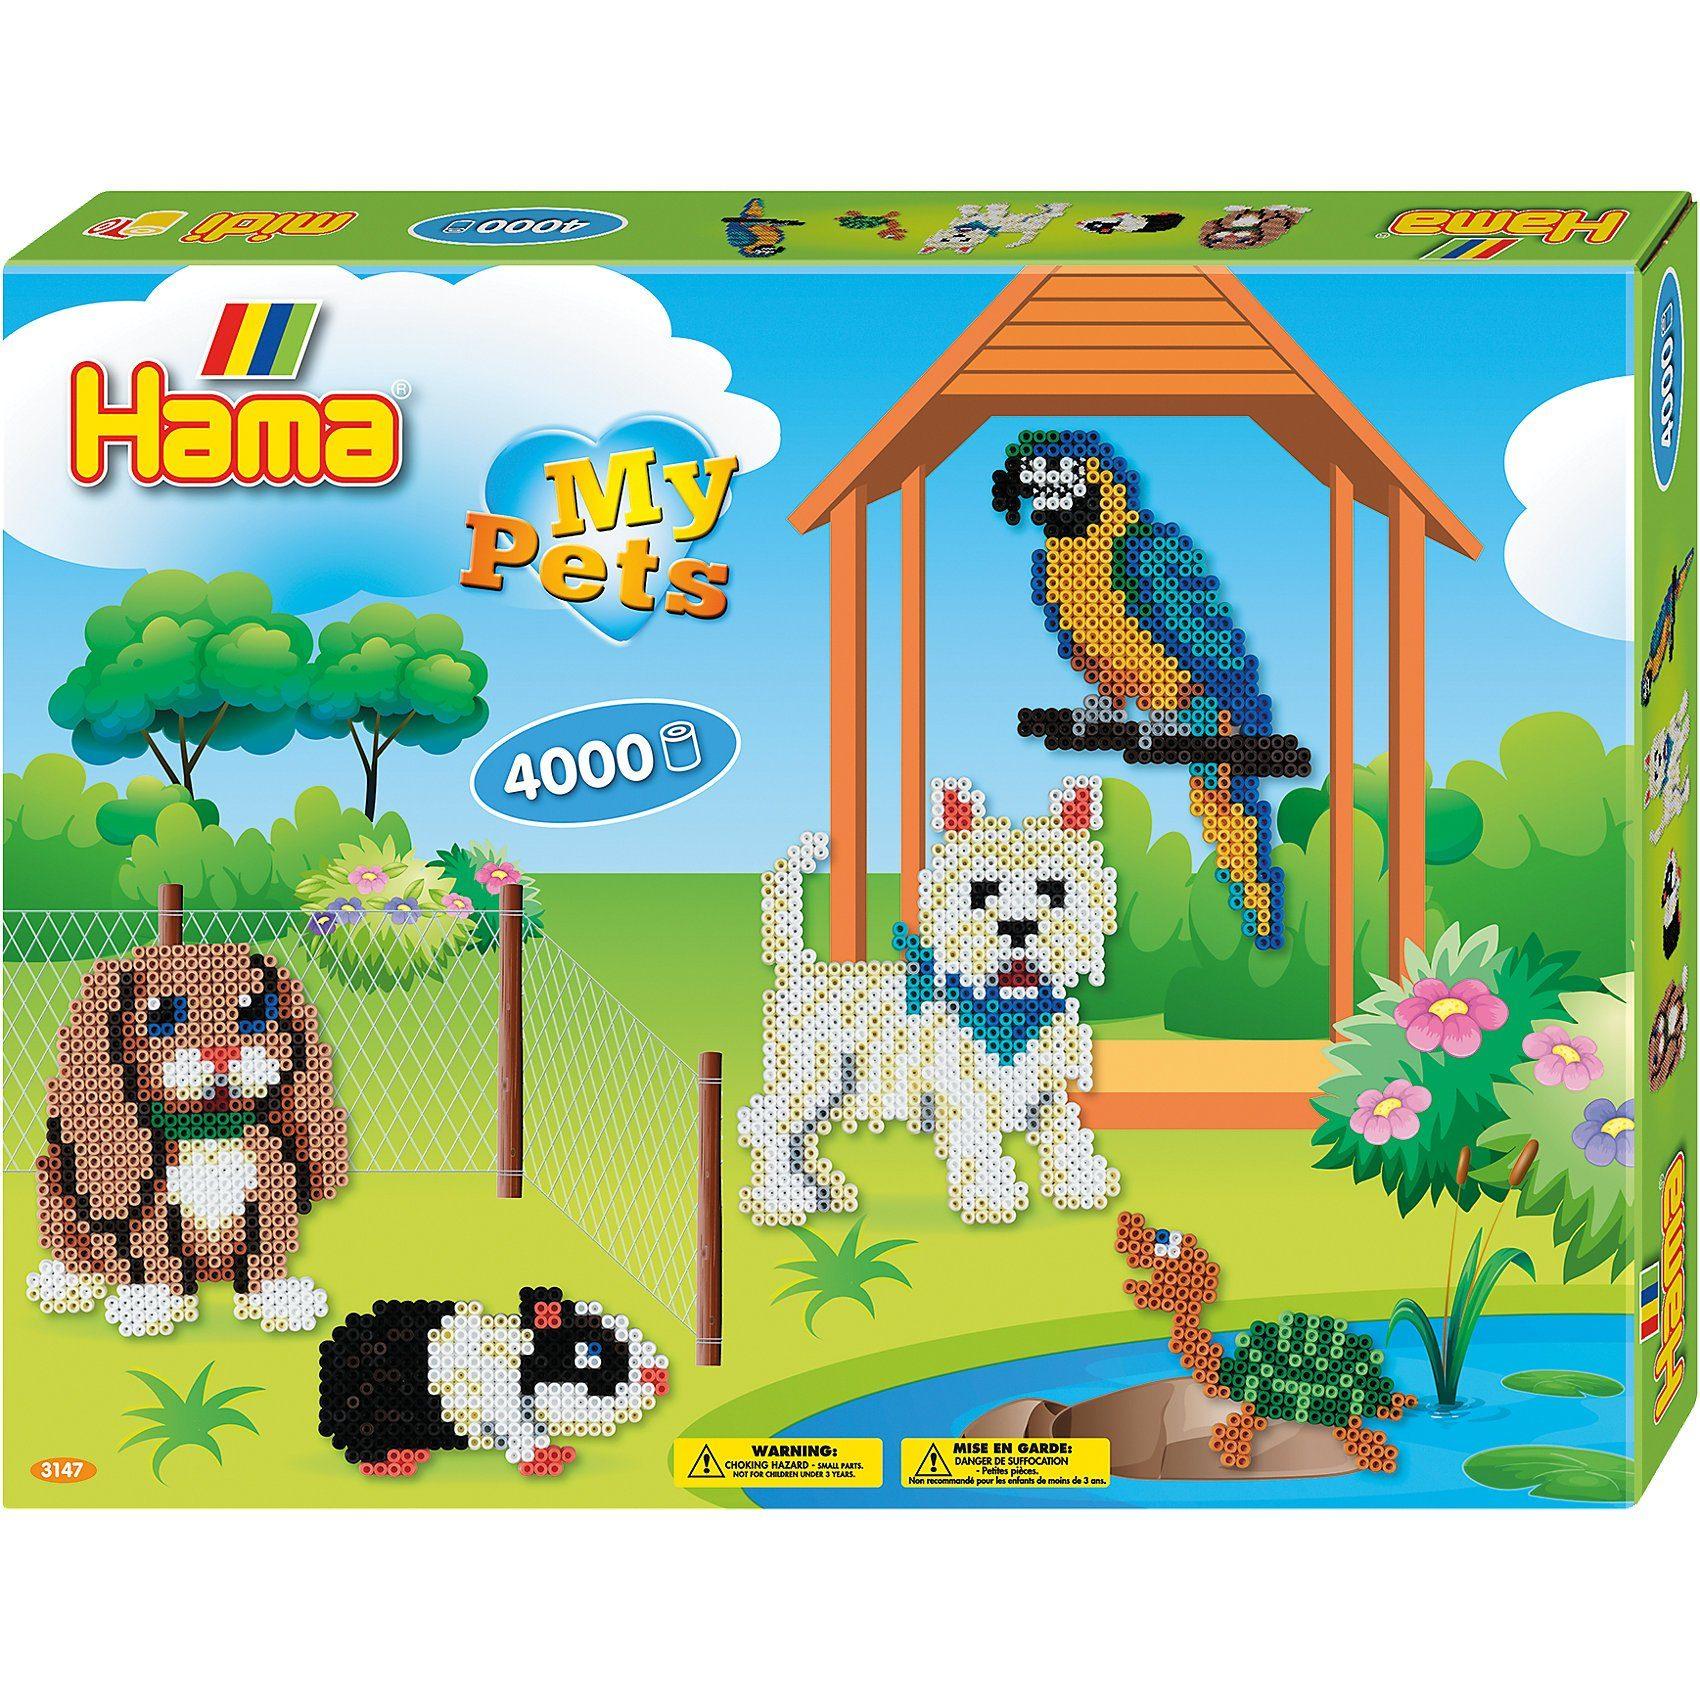 Hama Perlen HAMA 3147 Geschenkset Haustiere, 4.000 midi-Perlen & Zubehör